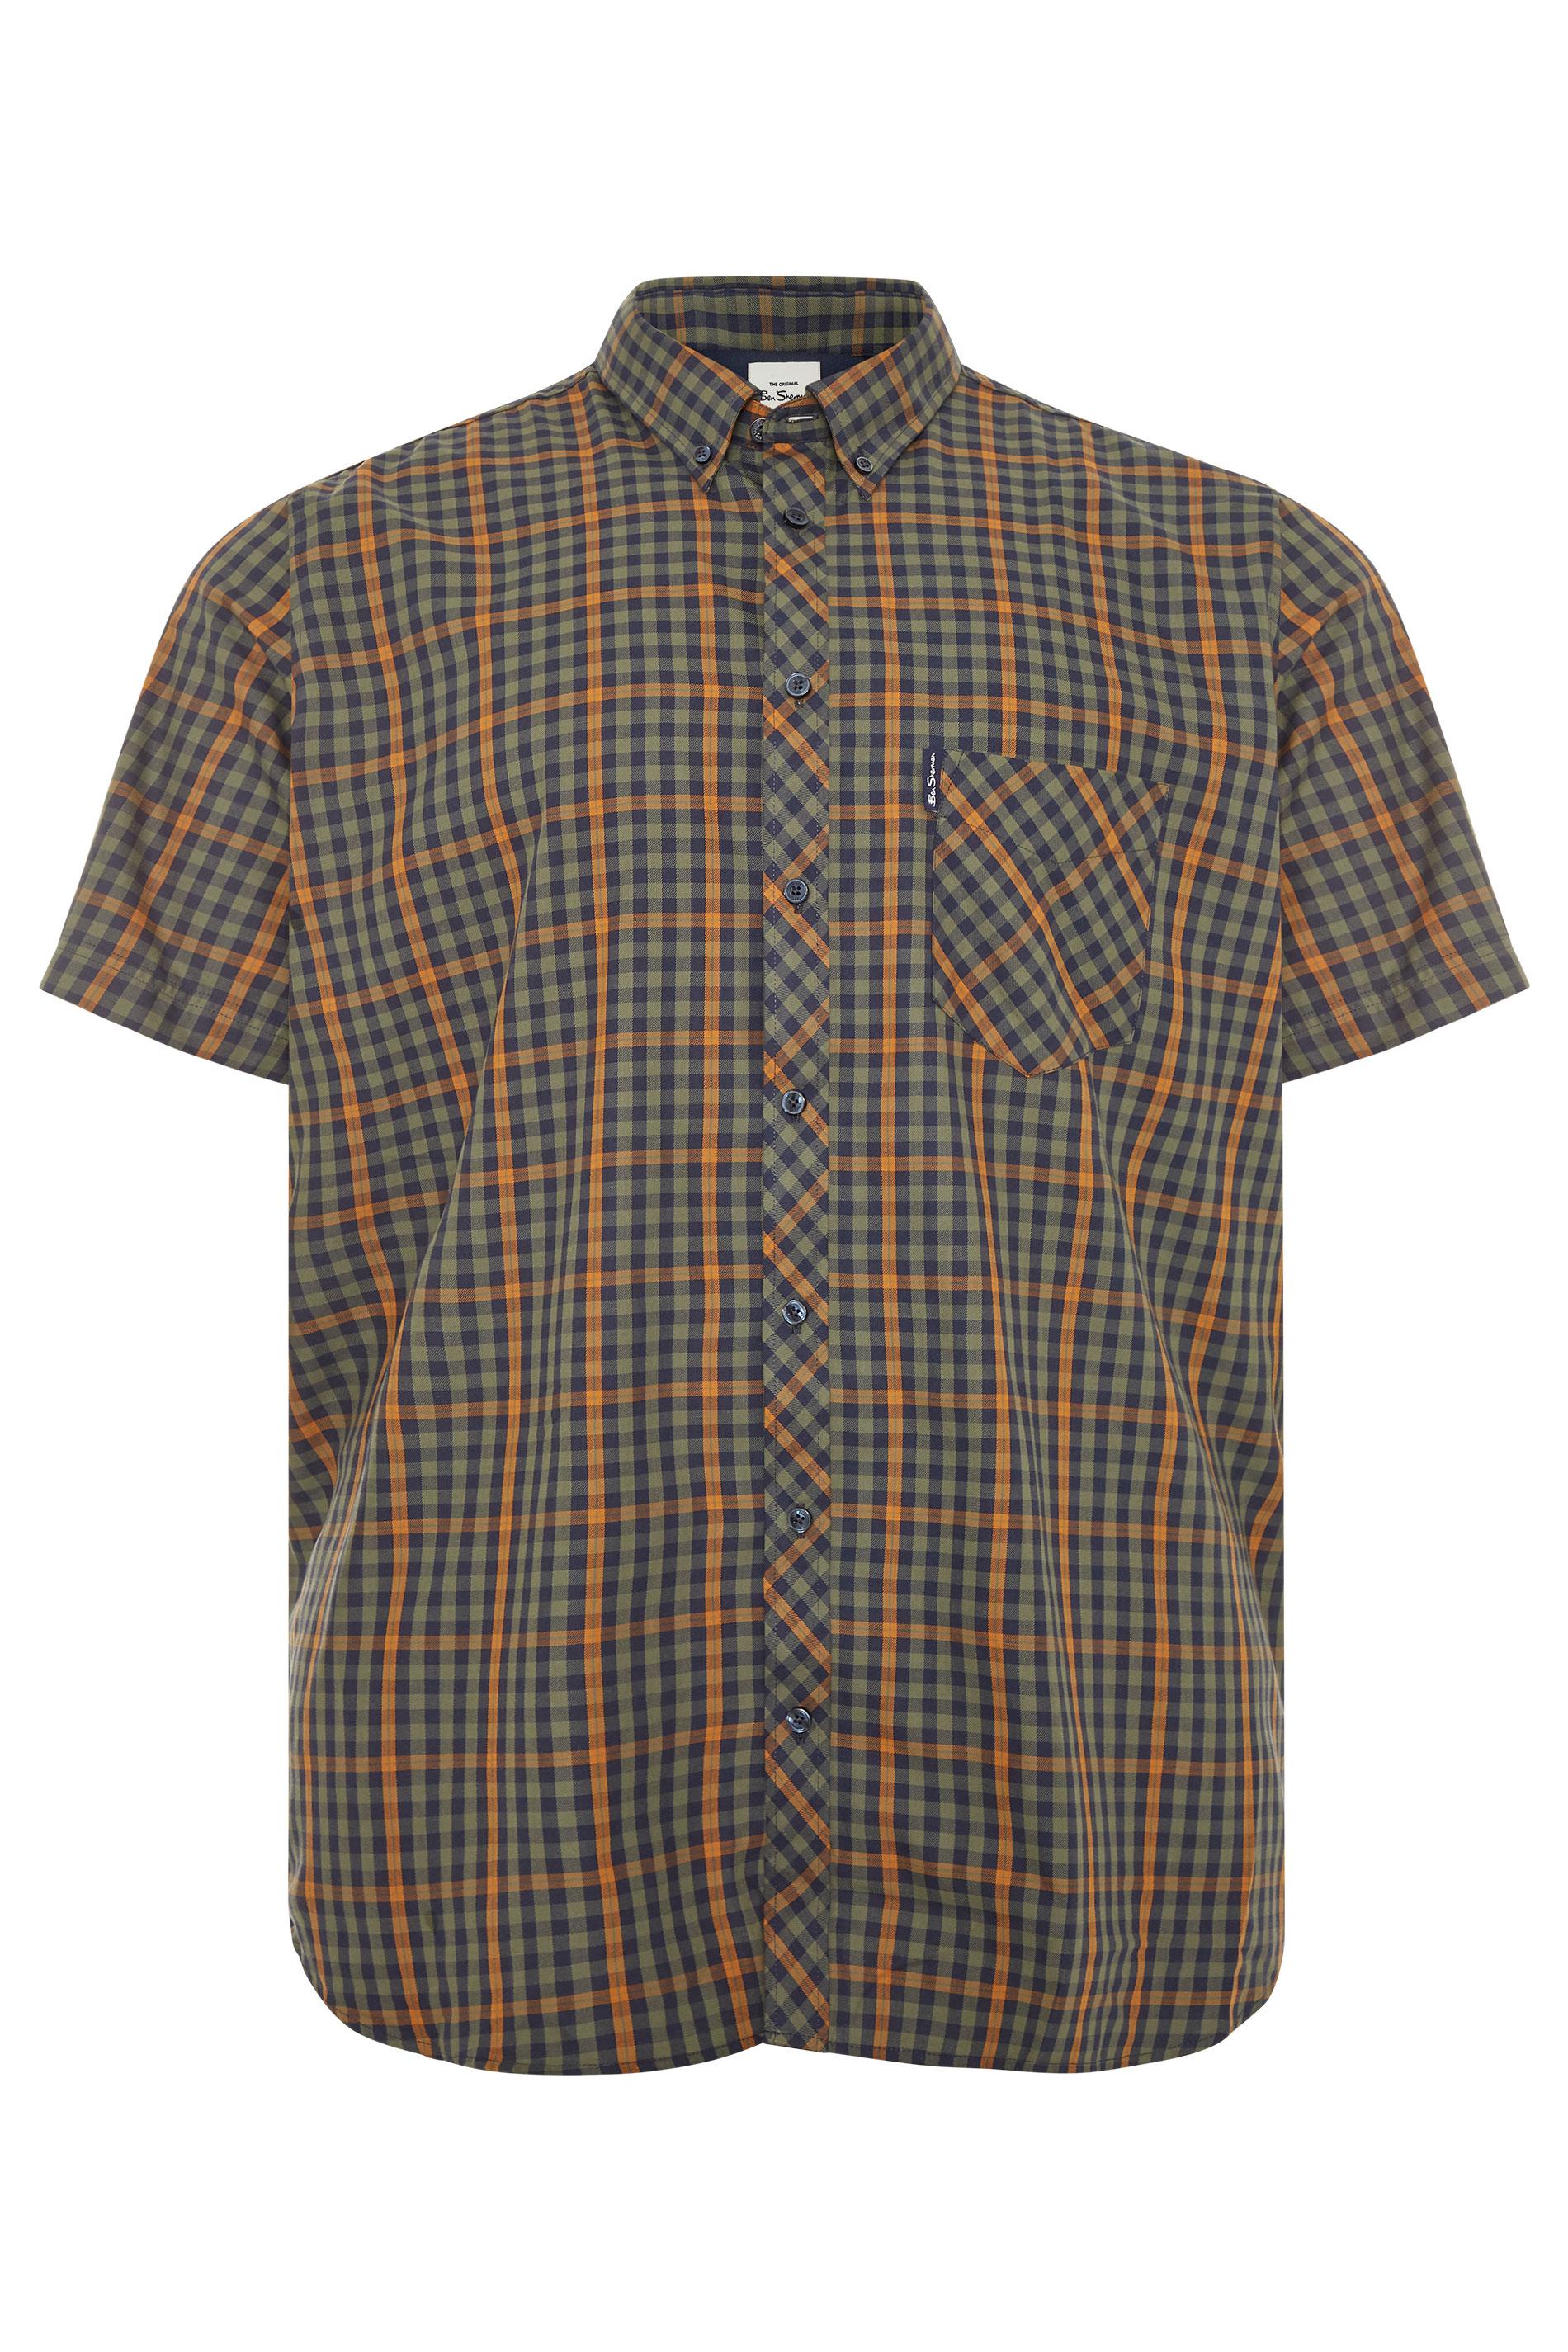 BEN SHERMAN Green Check Short Sleeve Shirt